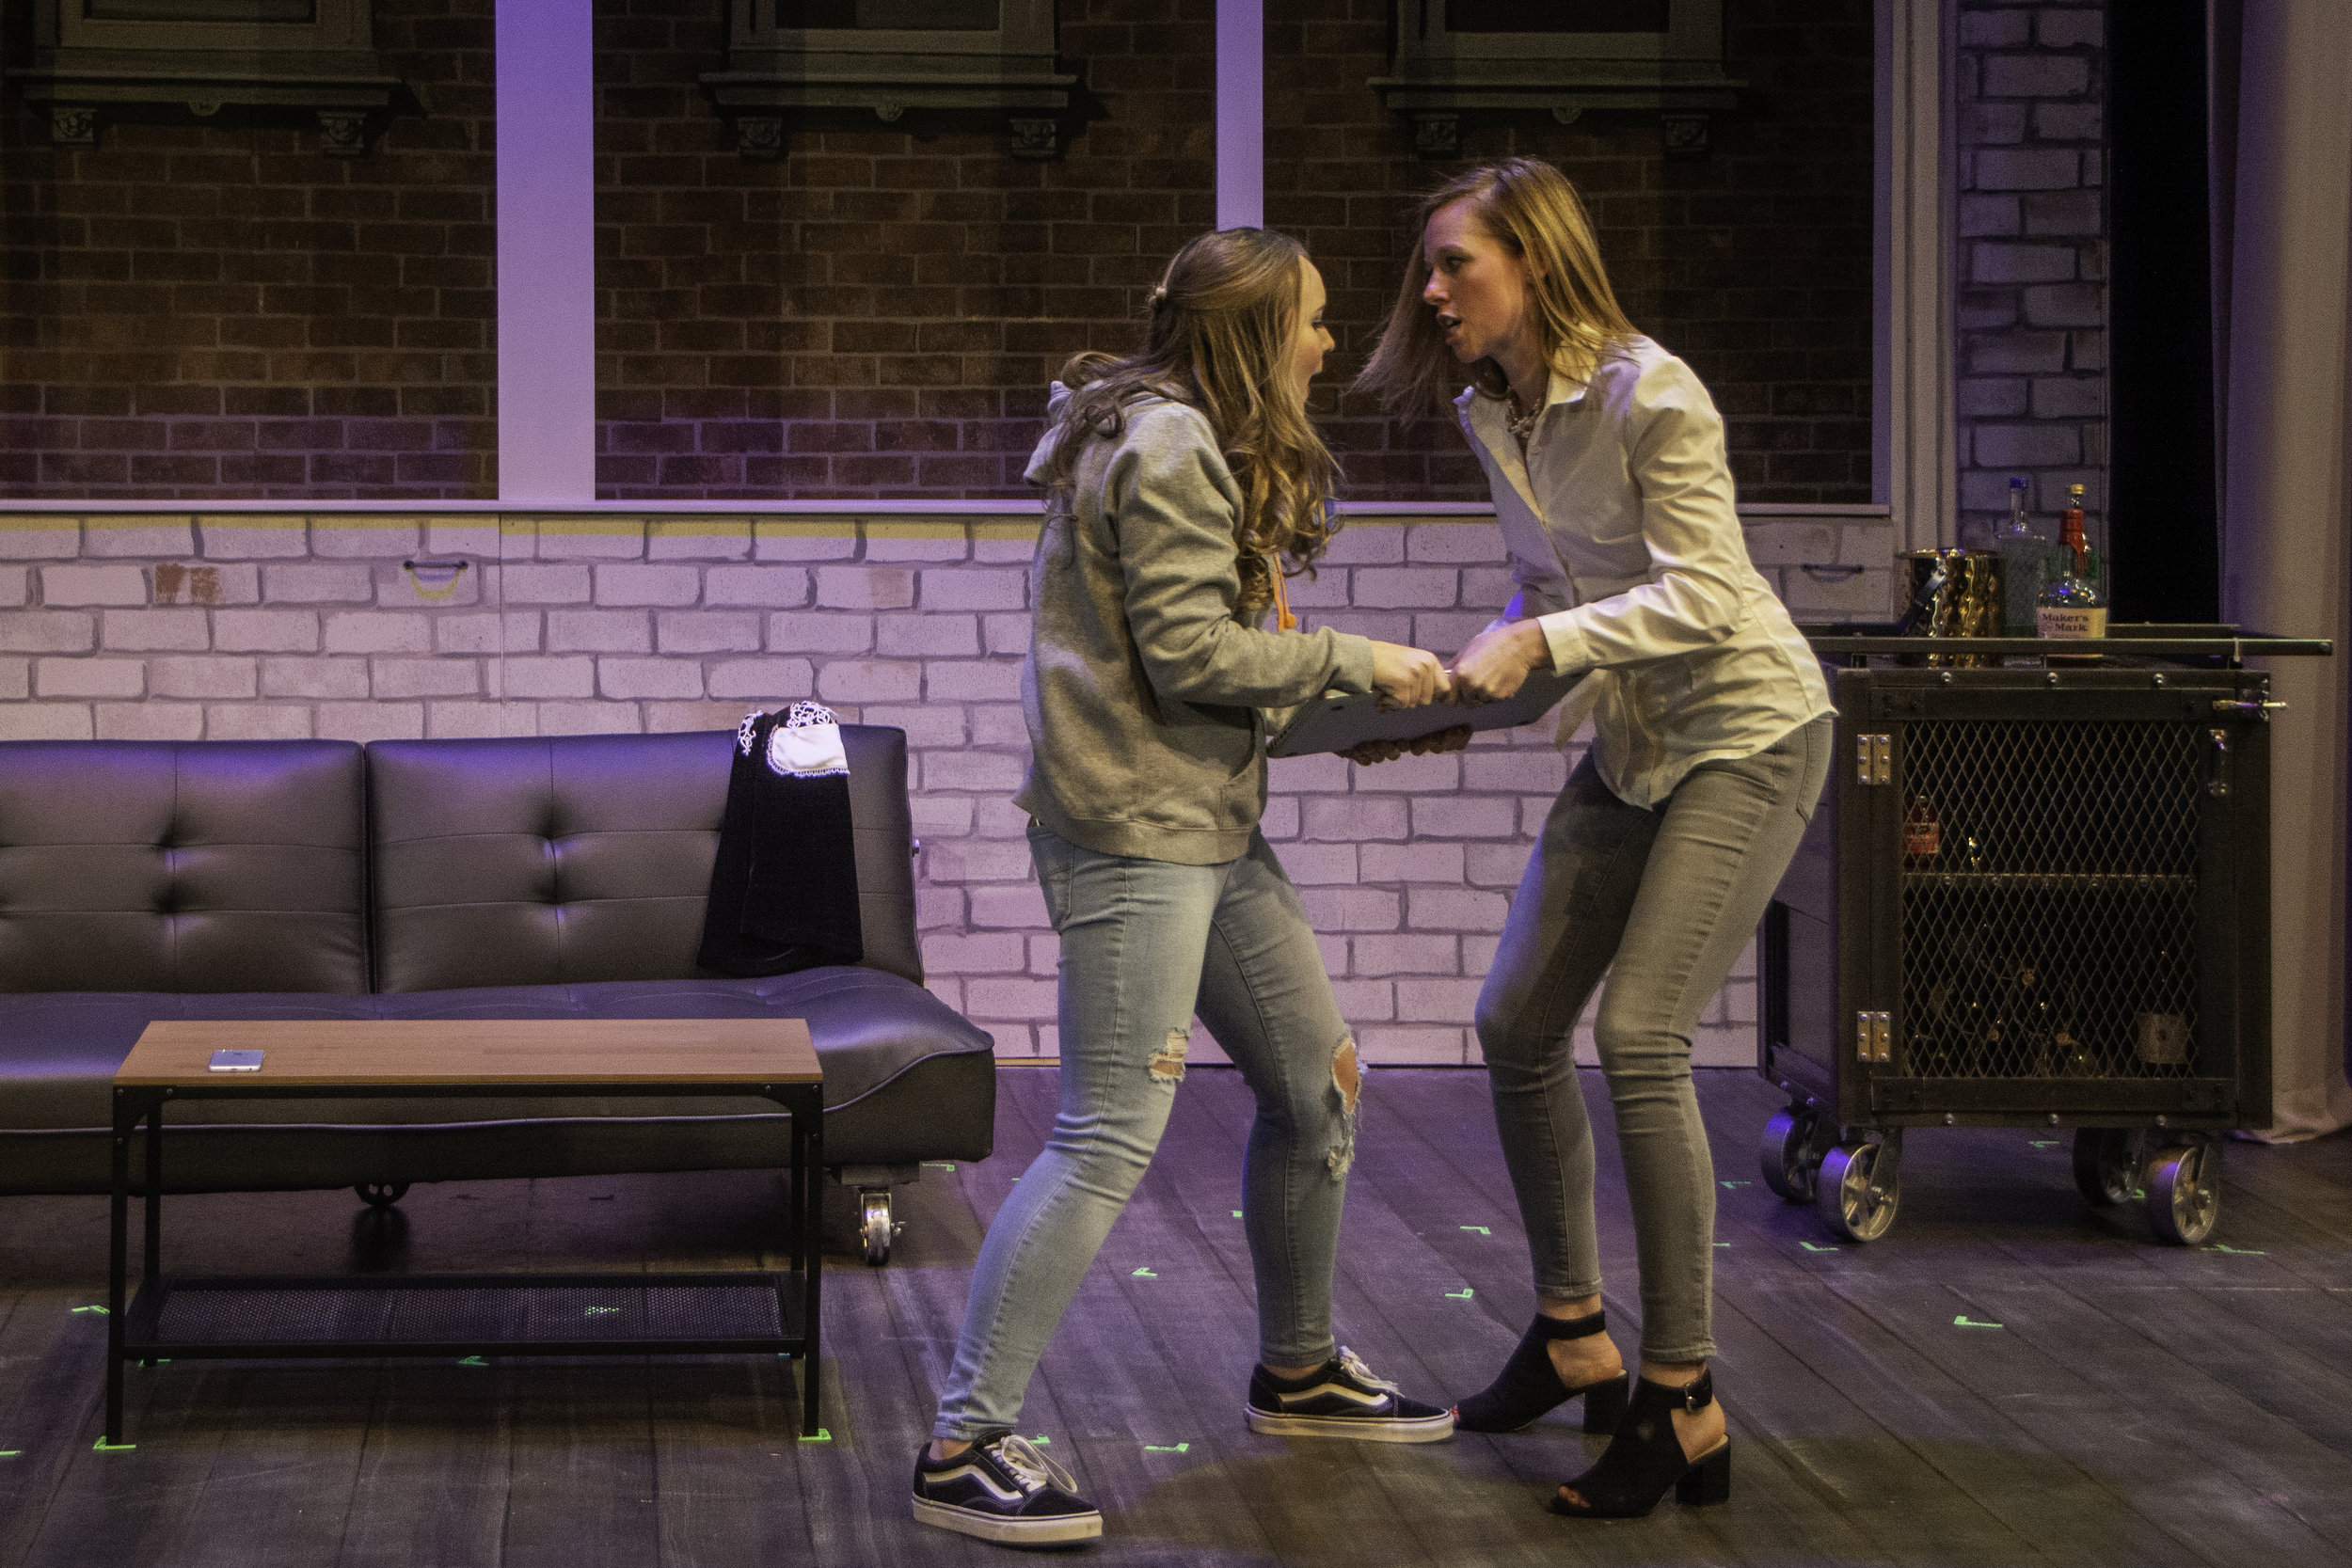 Orla Delaney as Harmony and Anna Botsford as Victoria. Photo by Alan Trugman.